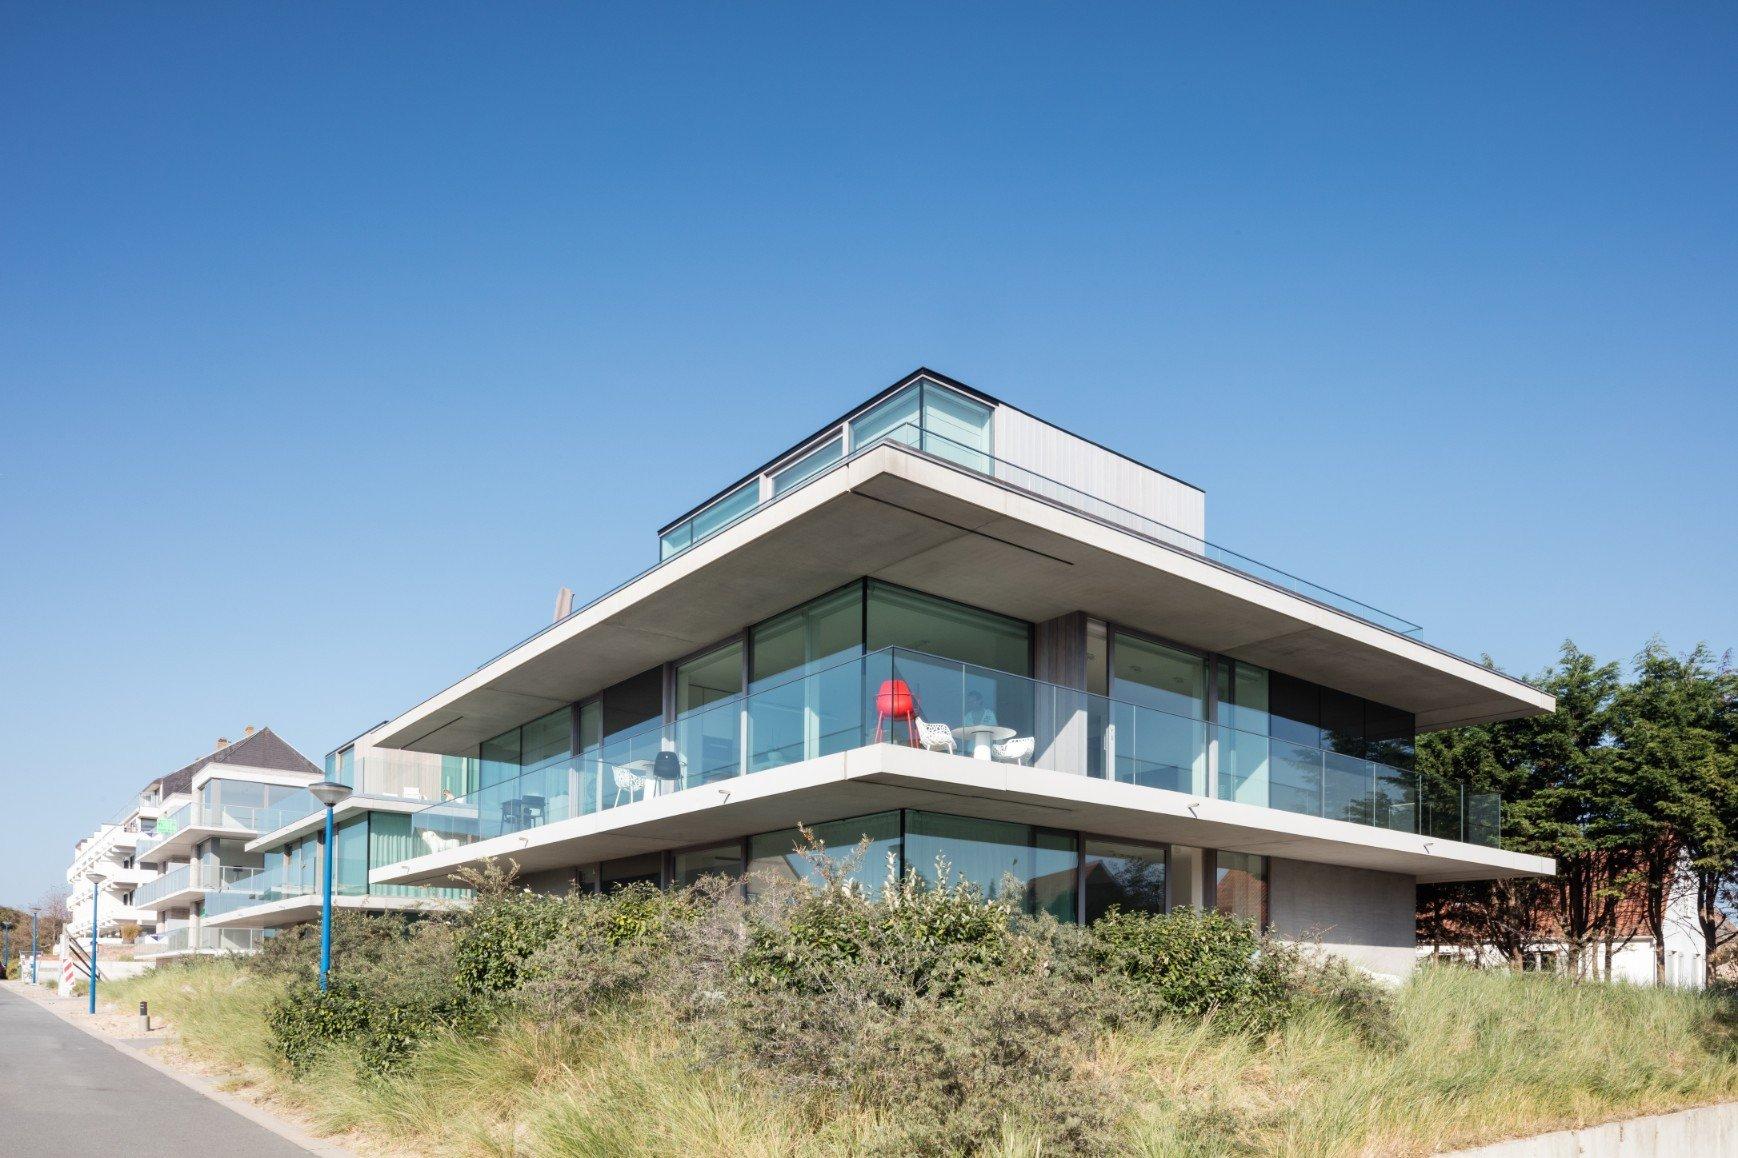 Rietveldprojects.be-Twins-Gropius-Breuer-appartement-design-architectuur-kust7